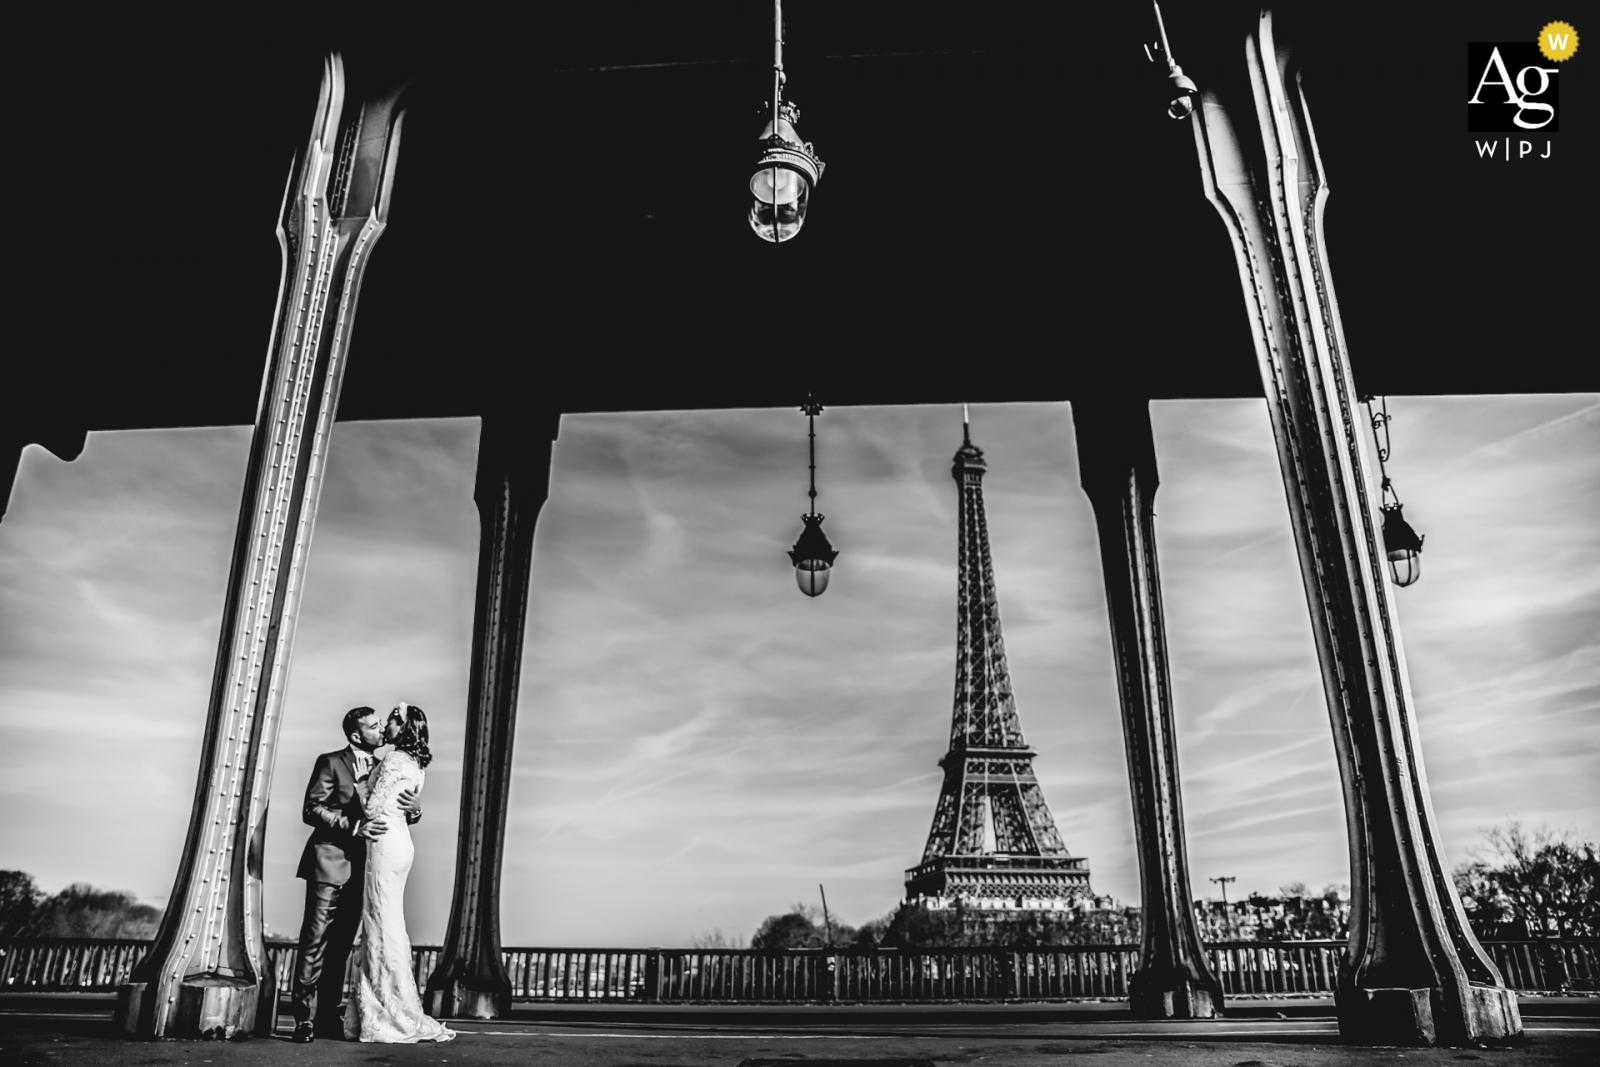 Paris - France Eiffel Tower portraits of the bride and groom - Under the bridge